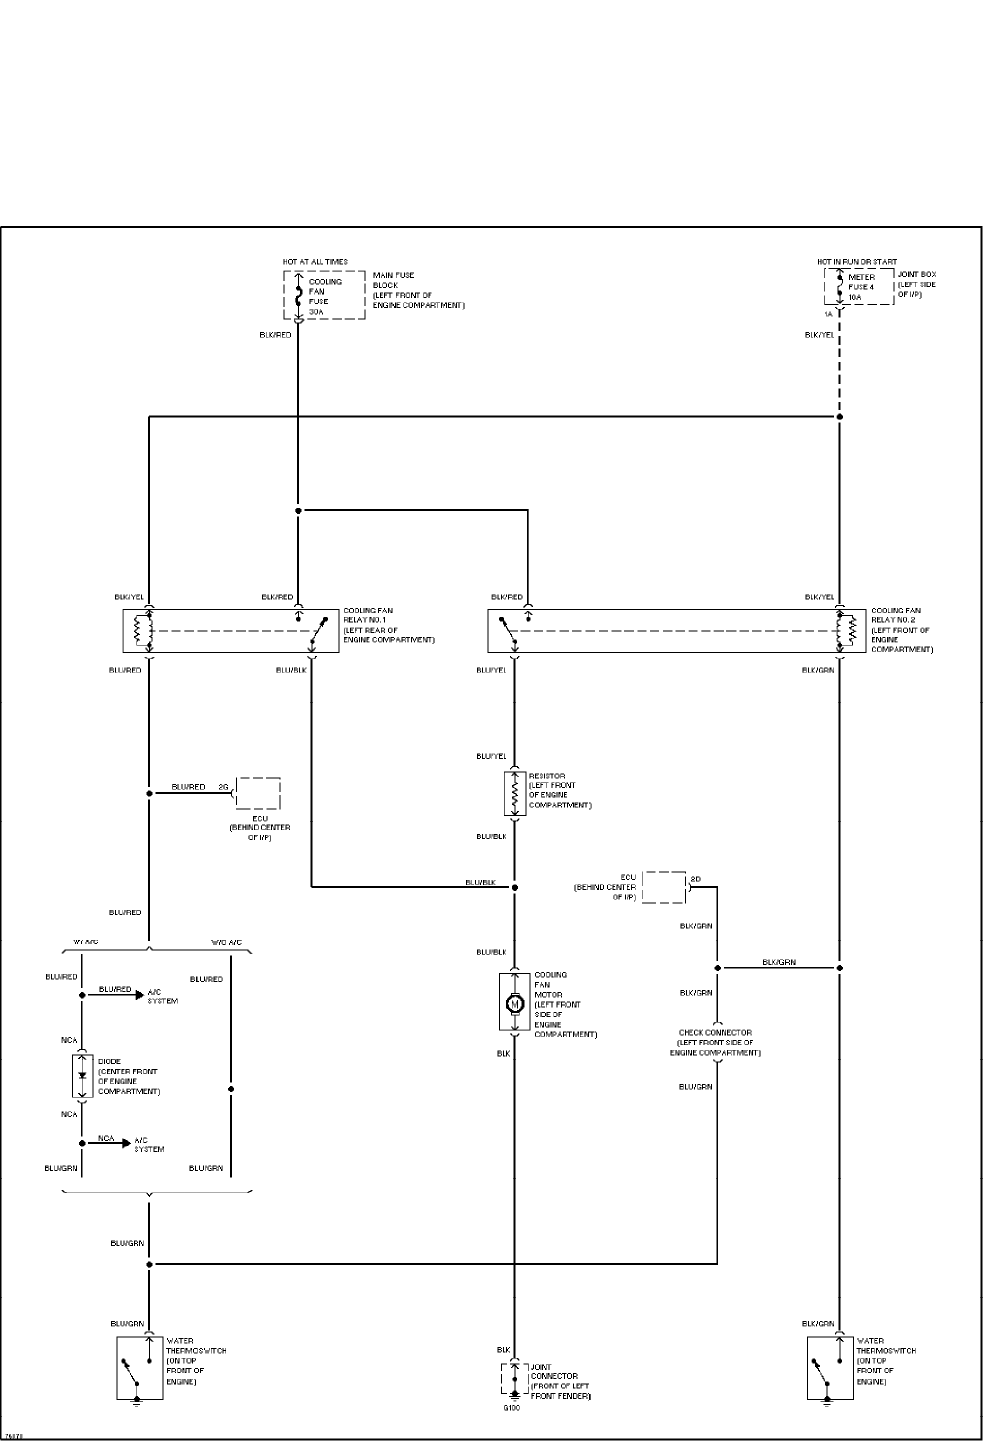 [DIAGRAM_38YU]  EZ_6750] 1990 Mazda 626 Wiring Diagram Free Diagram | 1990 Mazda 626 Wiring Diagram |  | Hete Erek Icism Lous Abole Alypt Bocep Hete Rous Oxyt Unec Wned Inrebe  Mohammedshrine Librar Wiring 101